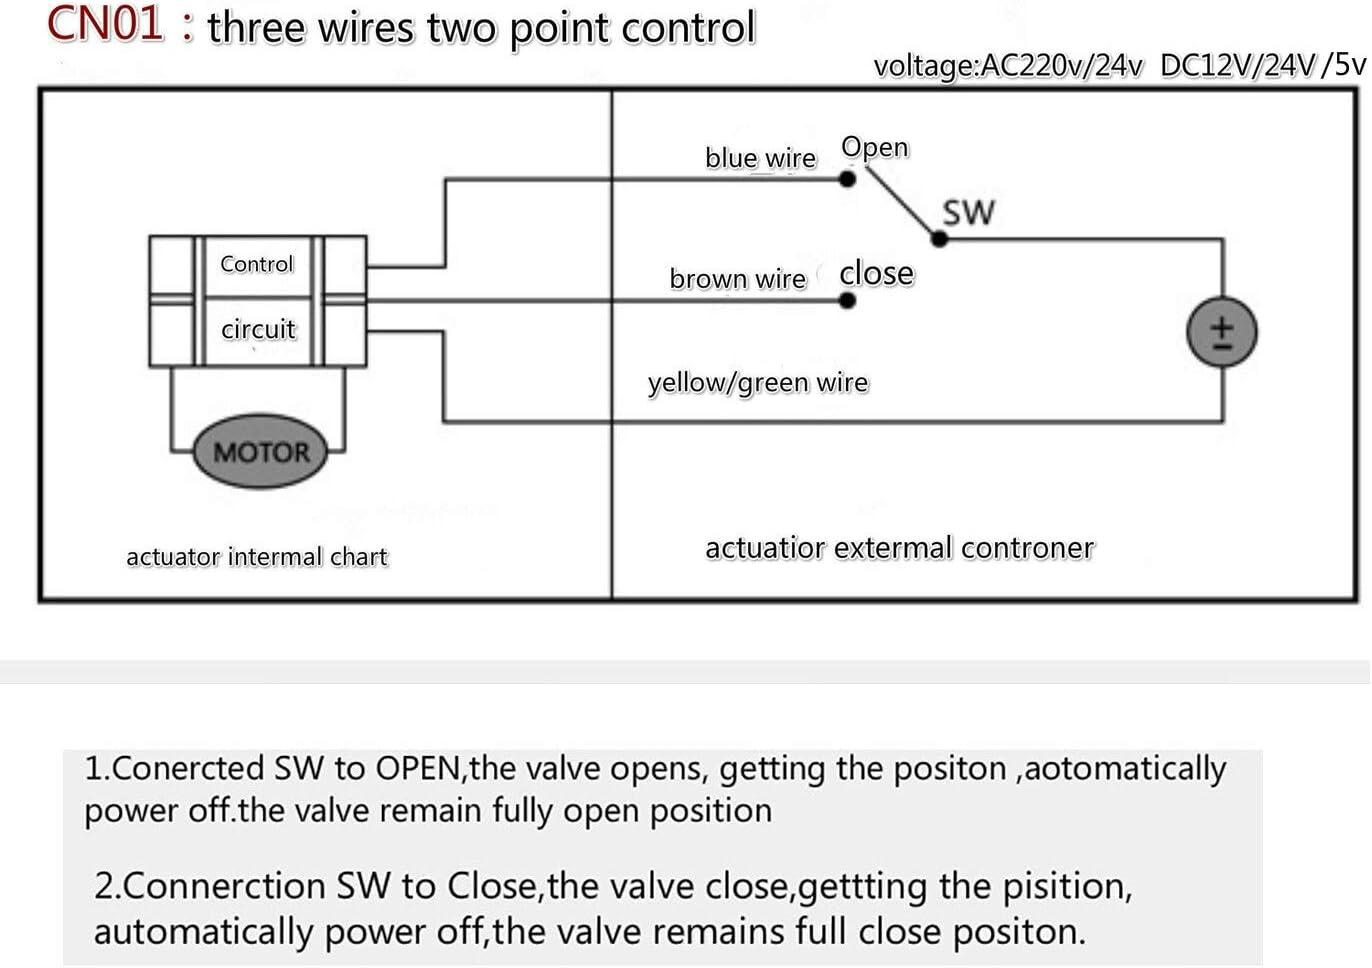 no-branded 3 Way AC220V//24V DC5V//12V//24V Brass Motorized Ball Valve Electric Ball Valve Electric Actuator Valve ZYUS Specification : DN32, Voltage : DC12V